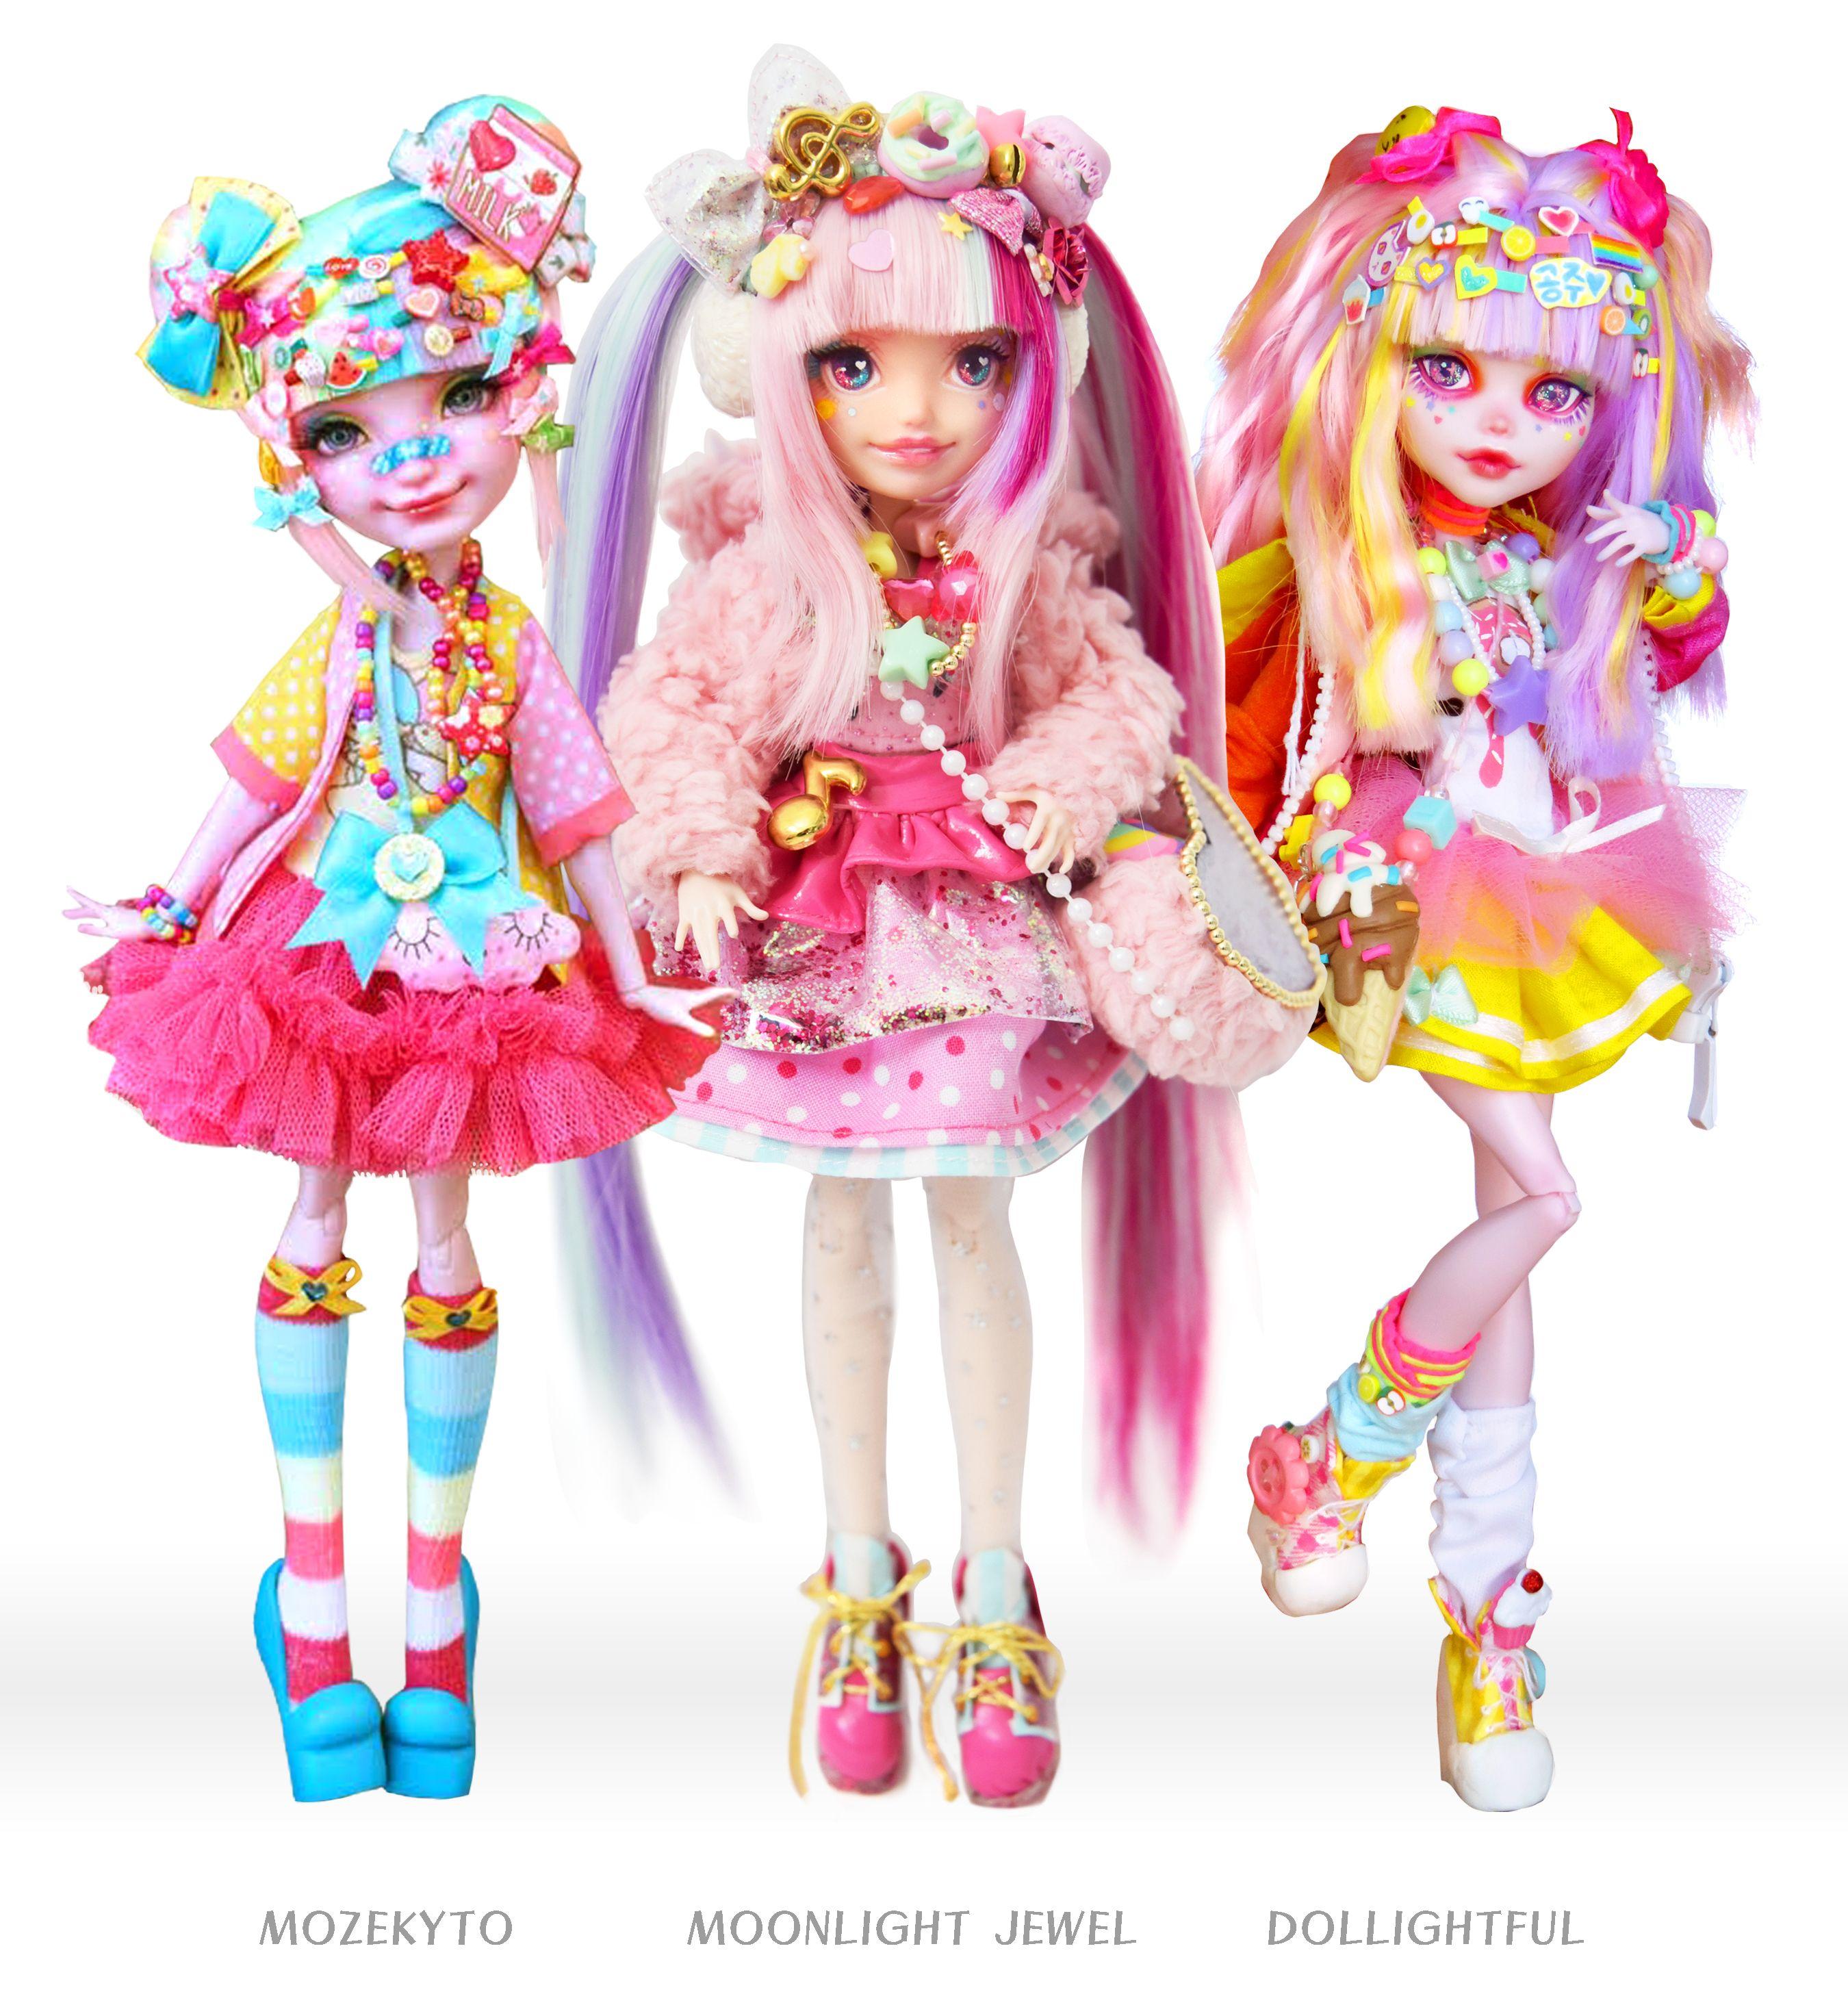 Decora Trio! The Harajuku Japanese fashion dolls by Mozekyto, Moonlight Jewel, and Dollightful. #dolls